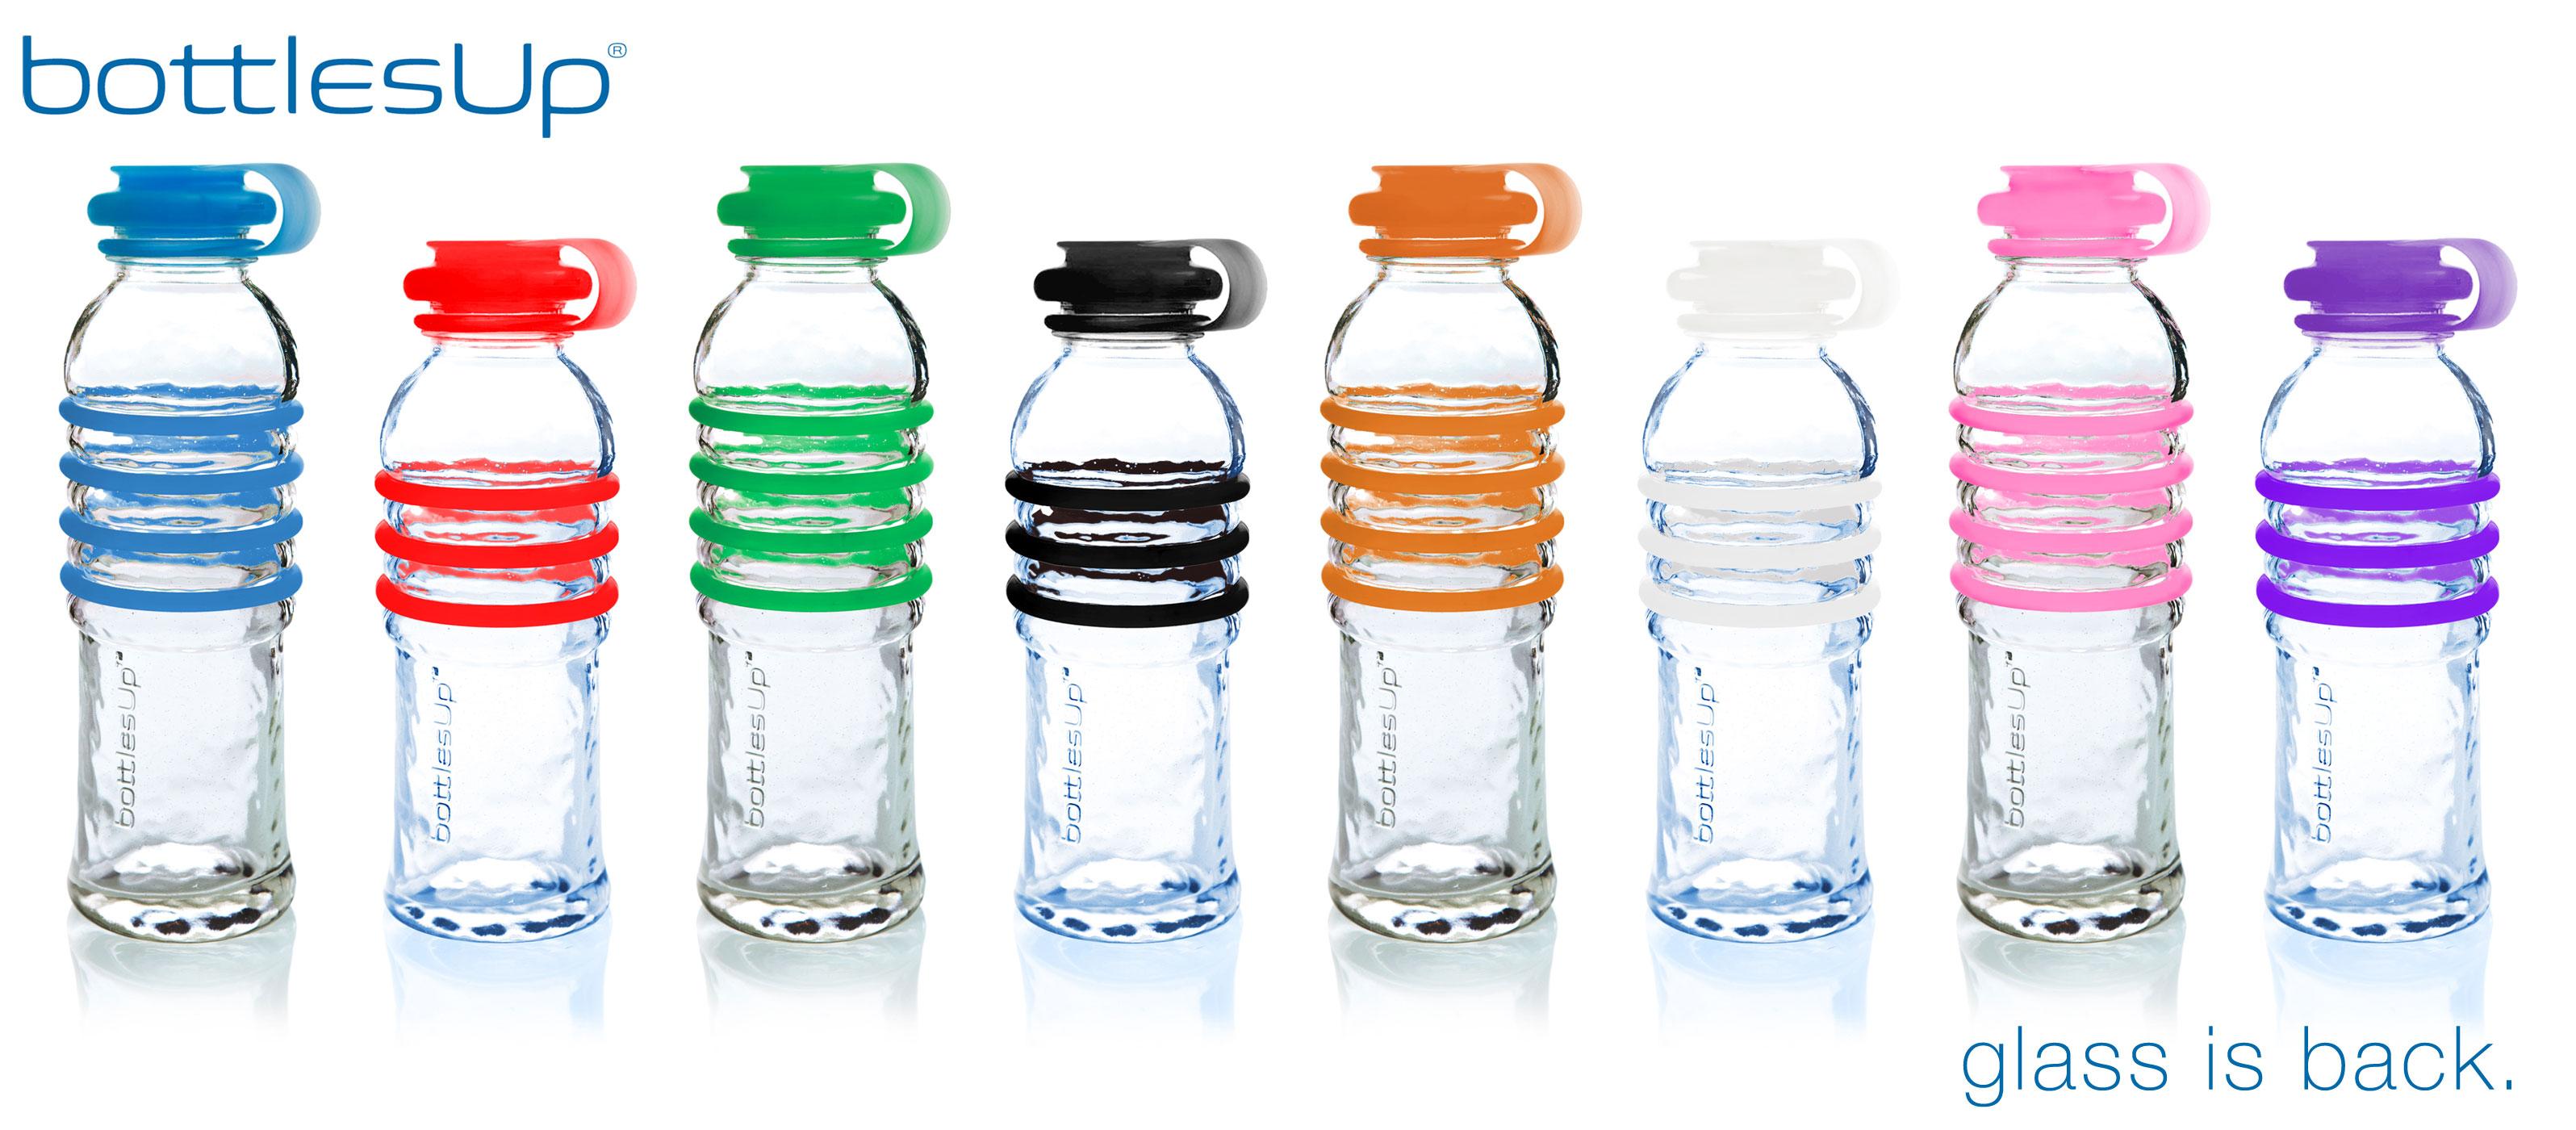 ... Specificati... Reusable Glass Water Bottle